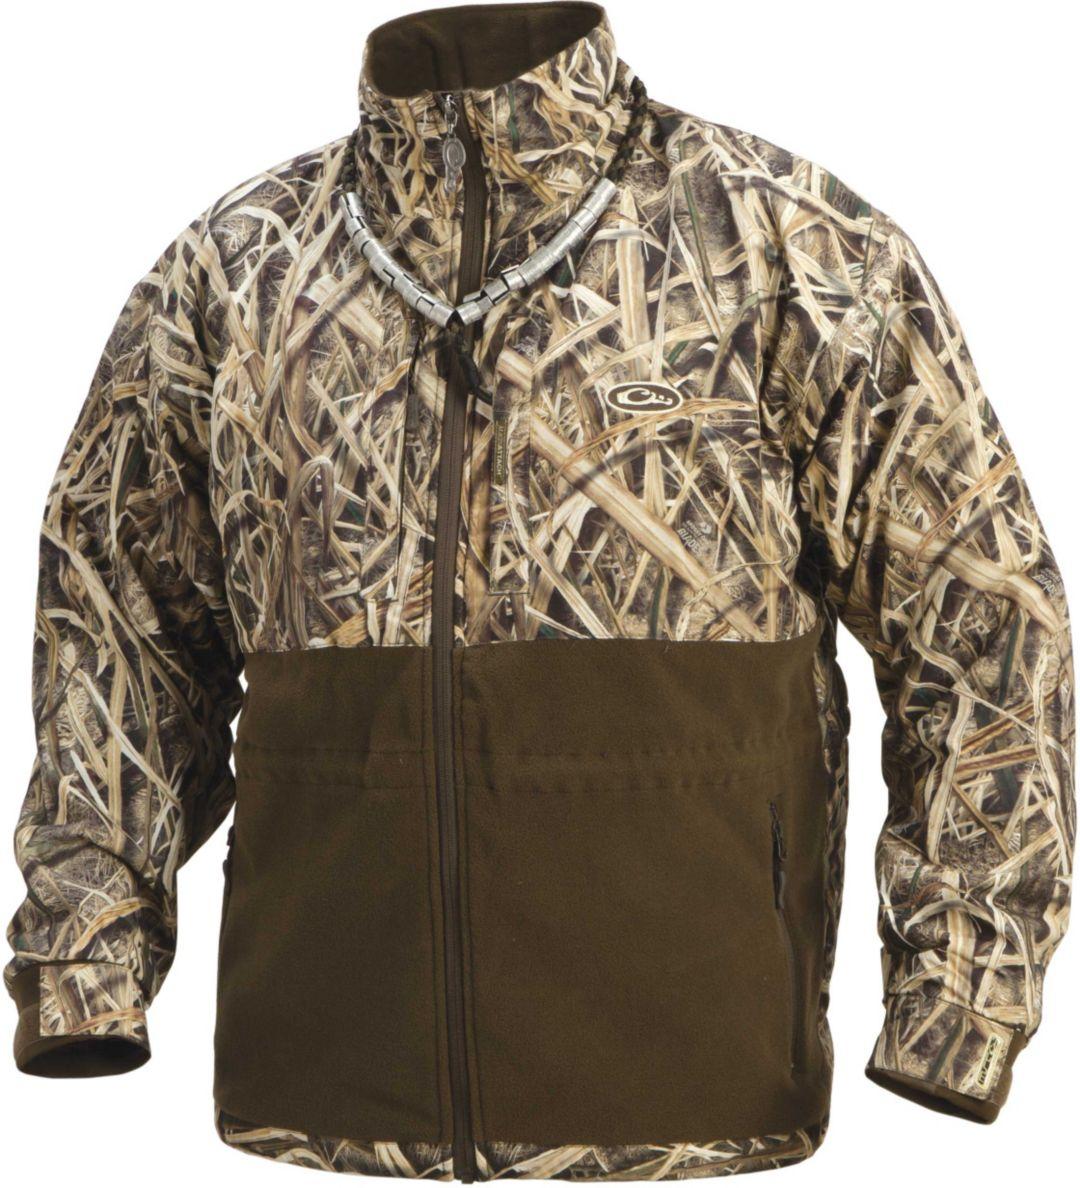 040976f289a49 Drake Waterfowl Men's MST Eqwader Plus Full Zip Jacket. noImageFound. 1